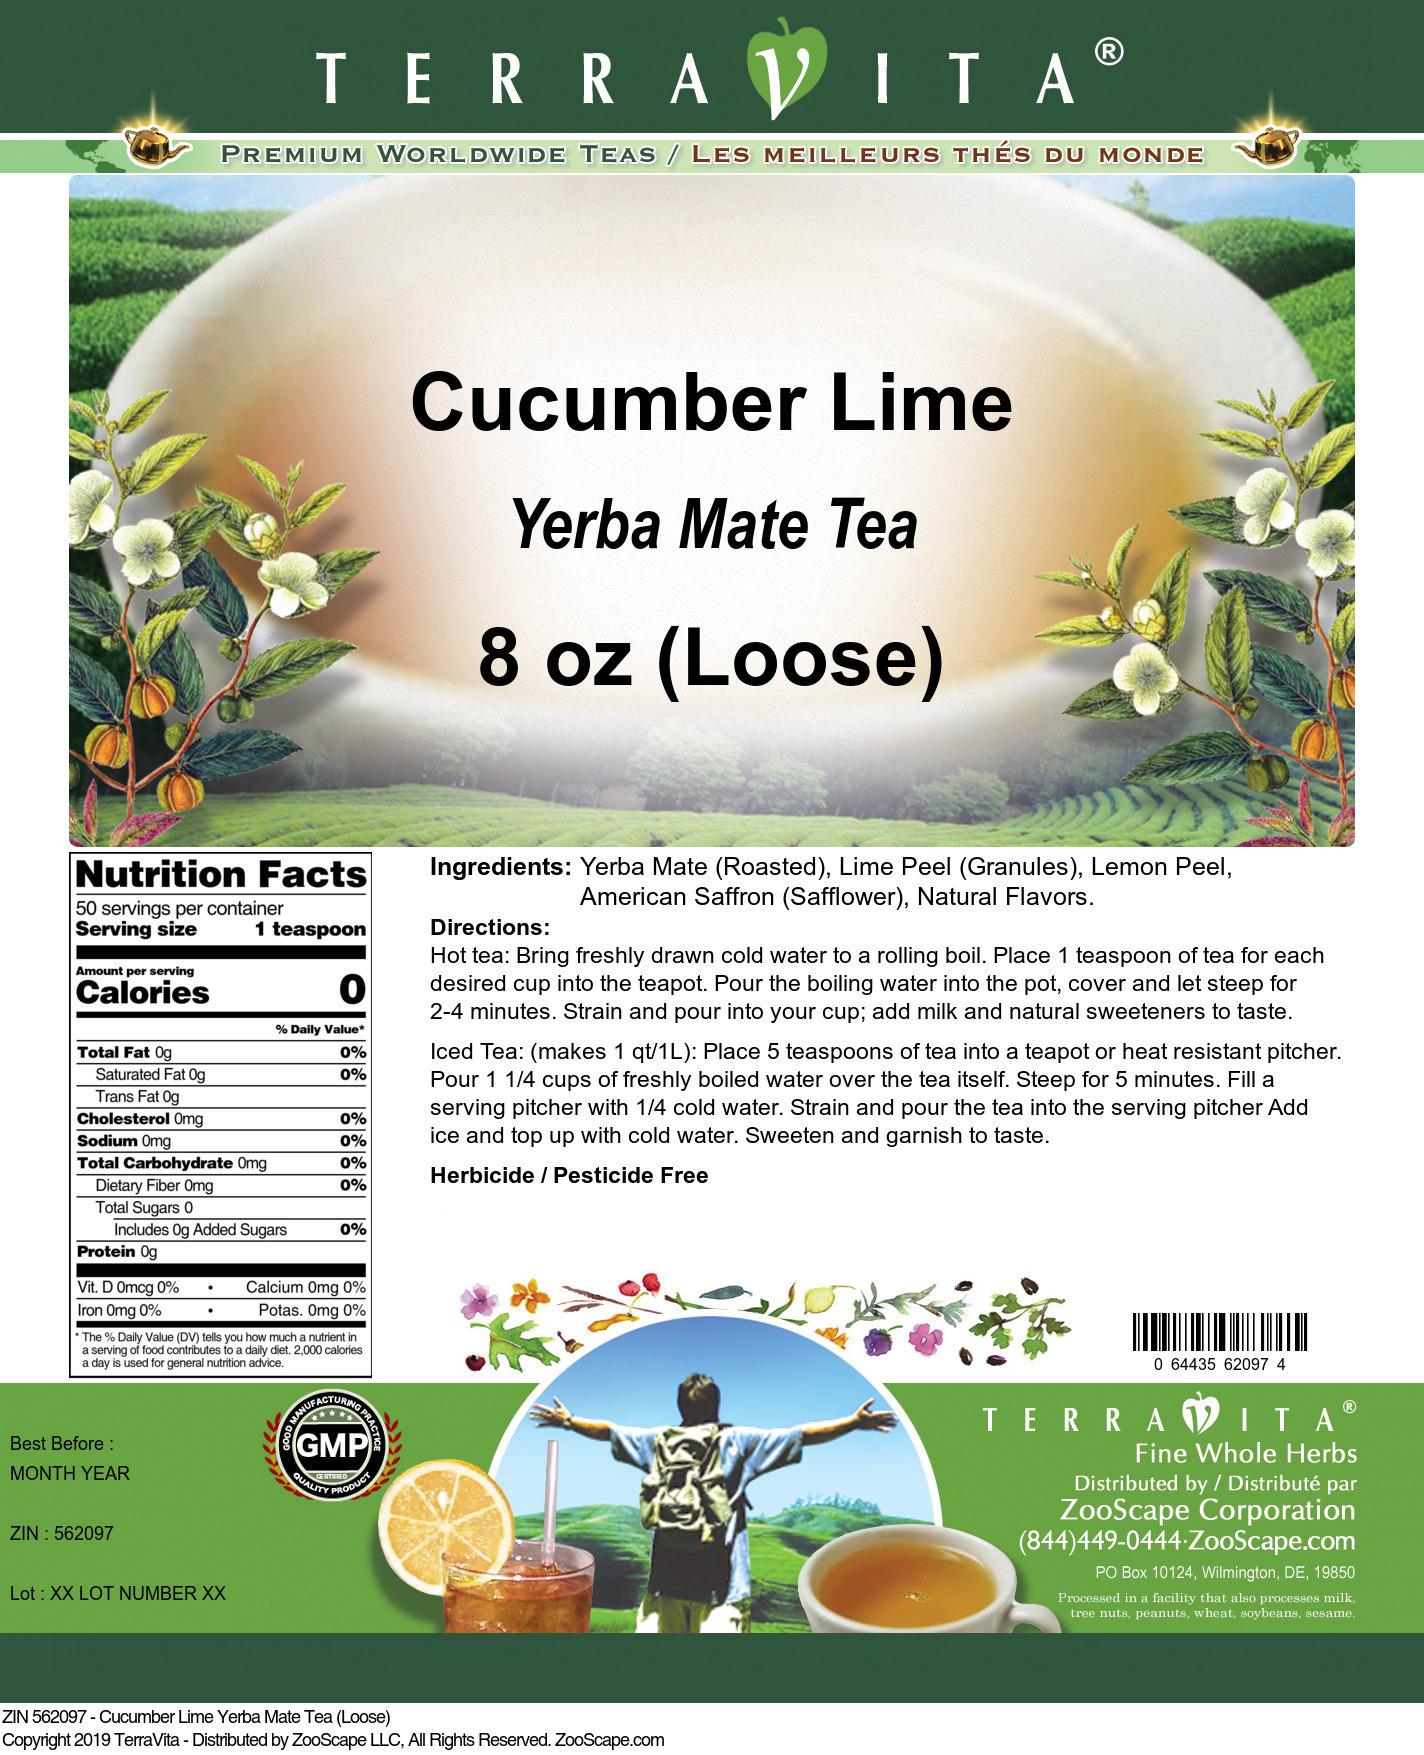 Cucumber Lime Yerba Mate